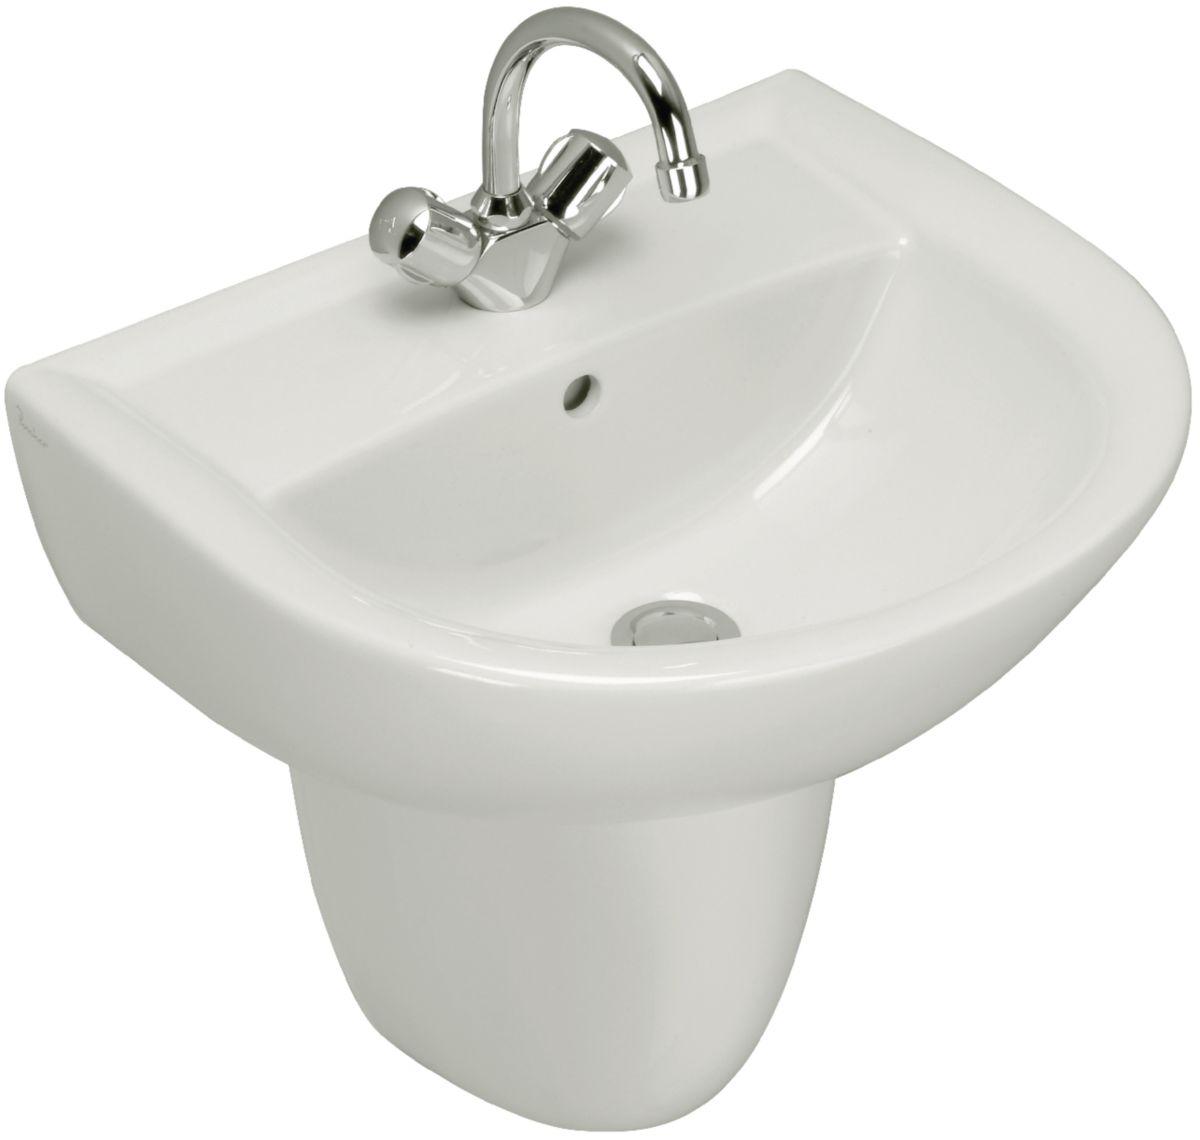 Cacher un bidet - A quoi sert un bidet dans une salle de bain ...